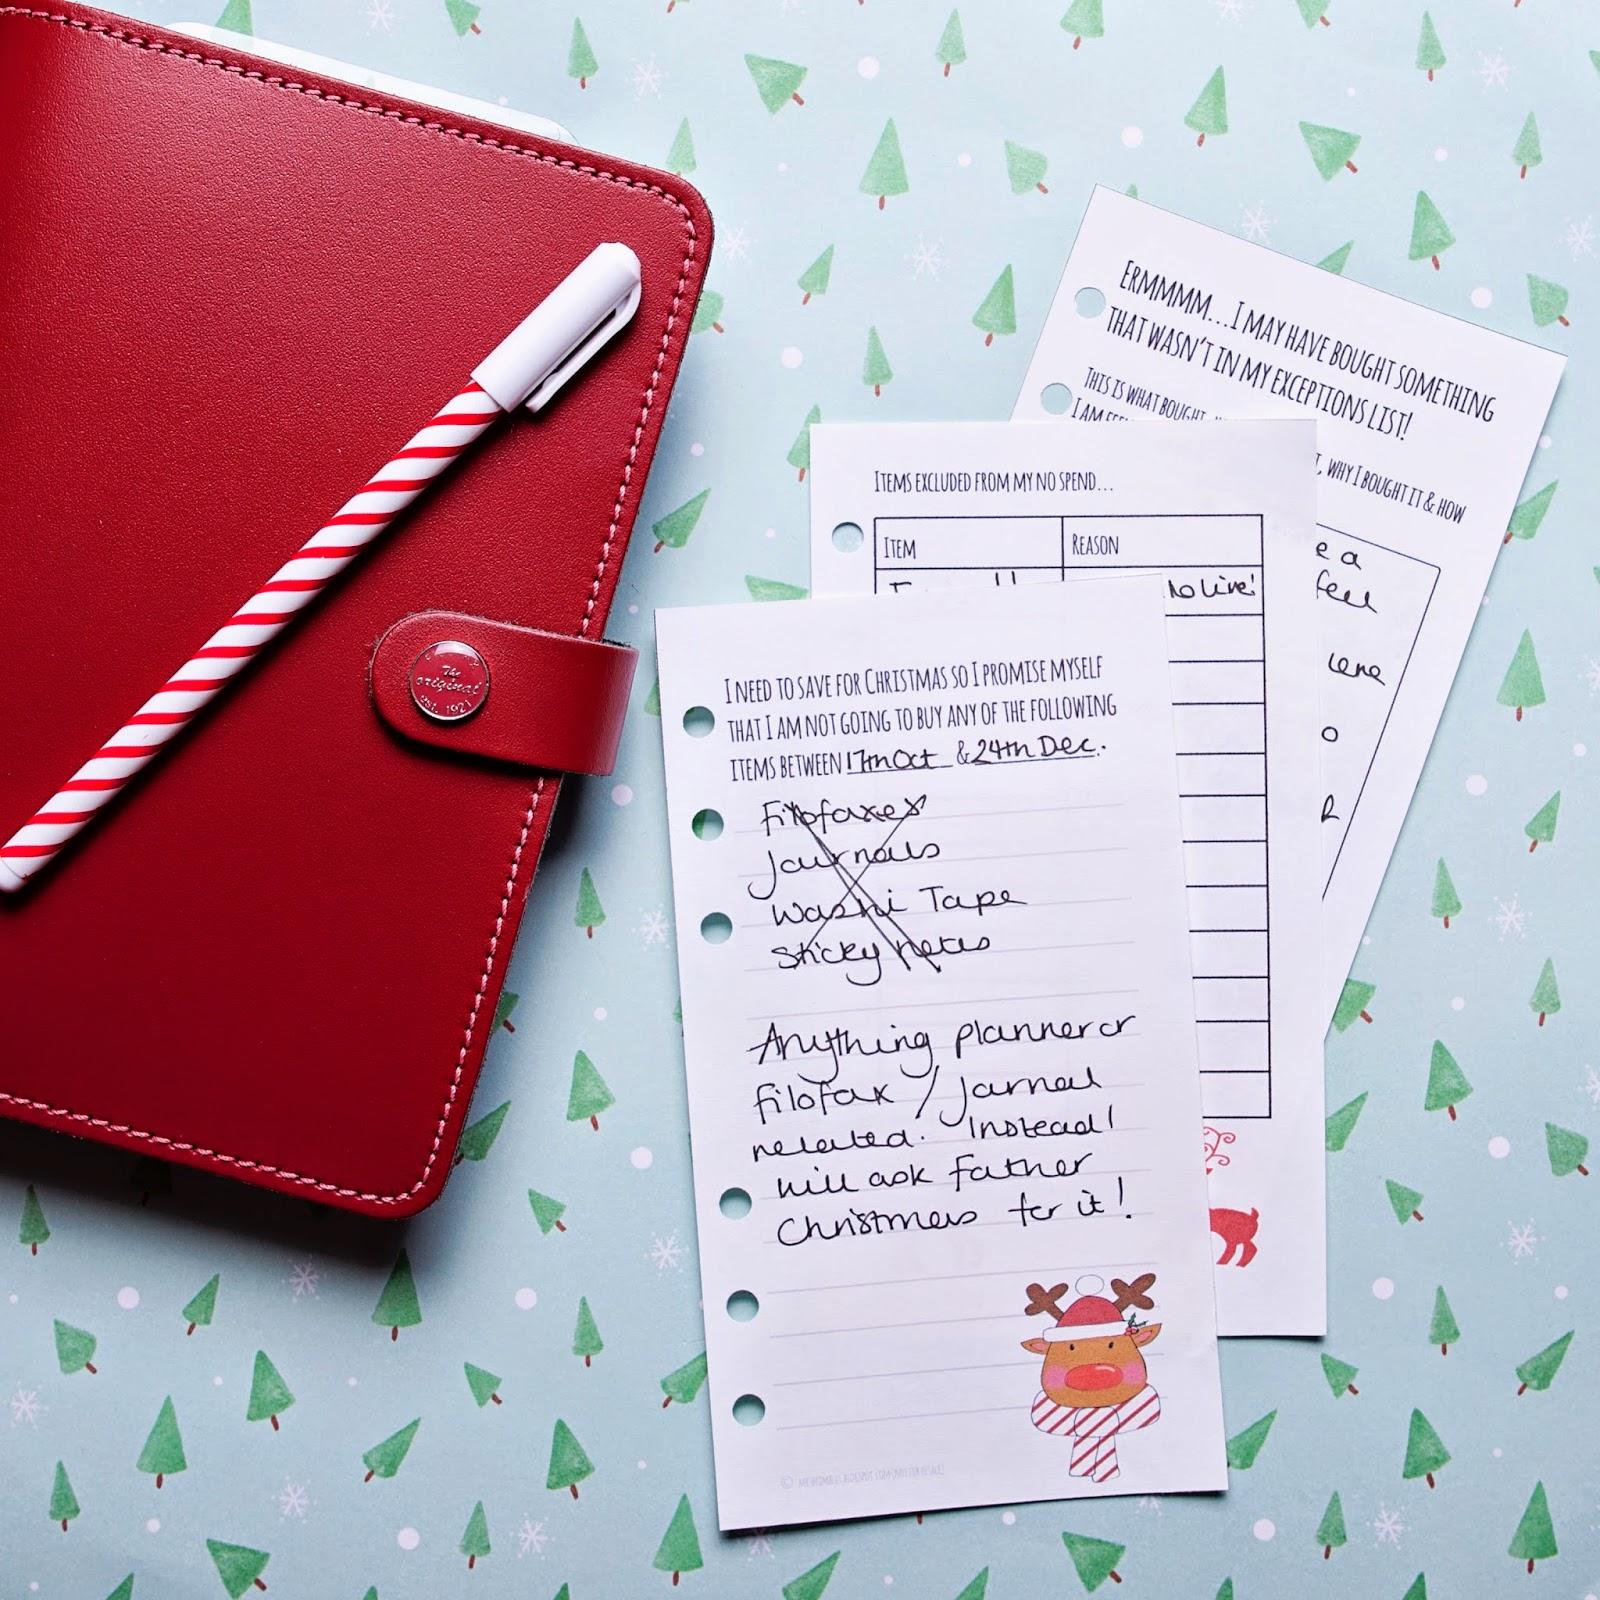 Mrs Brimbles: Planning for Christmas - Budgets & Money - Filofax Friday